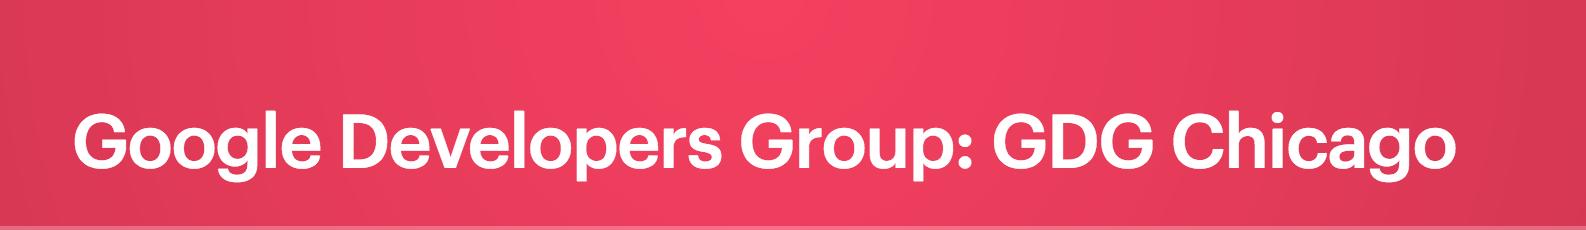 Lightning Talks with Google Developers Group